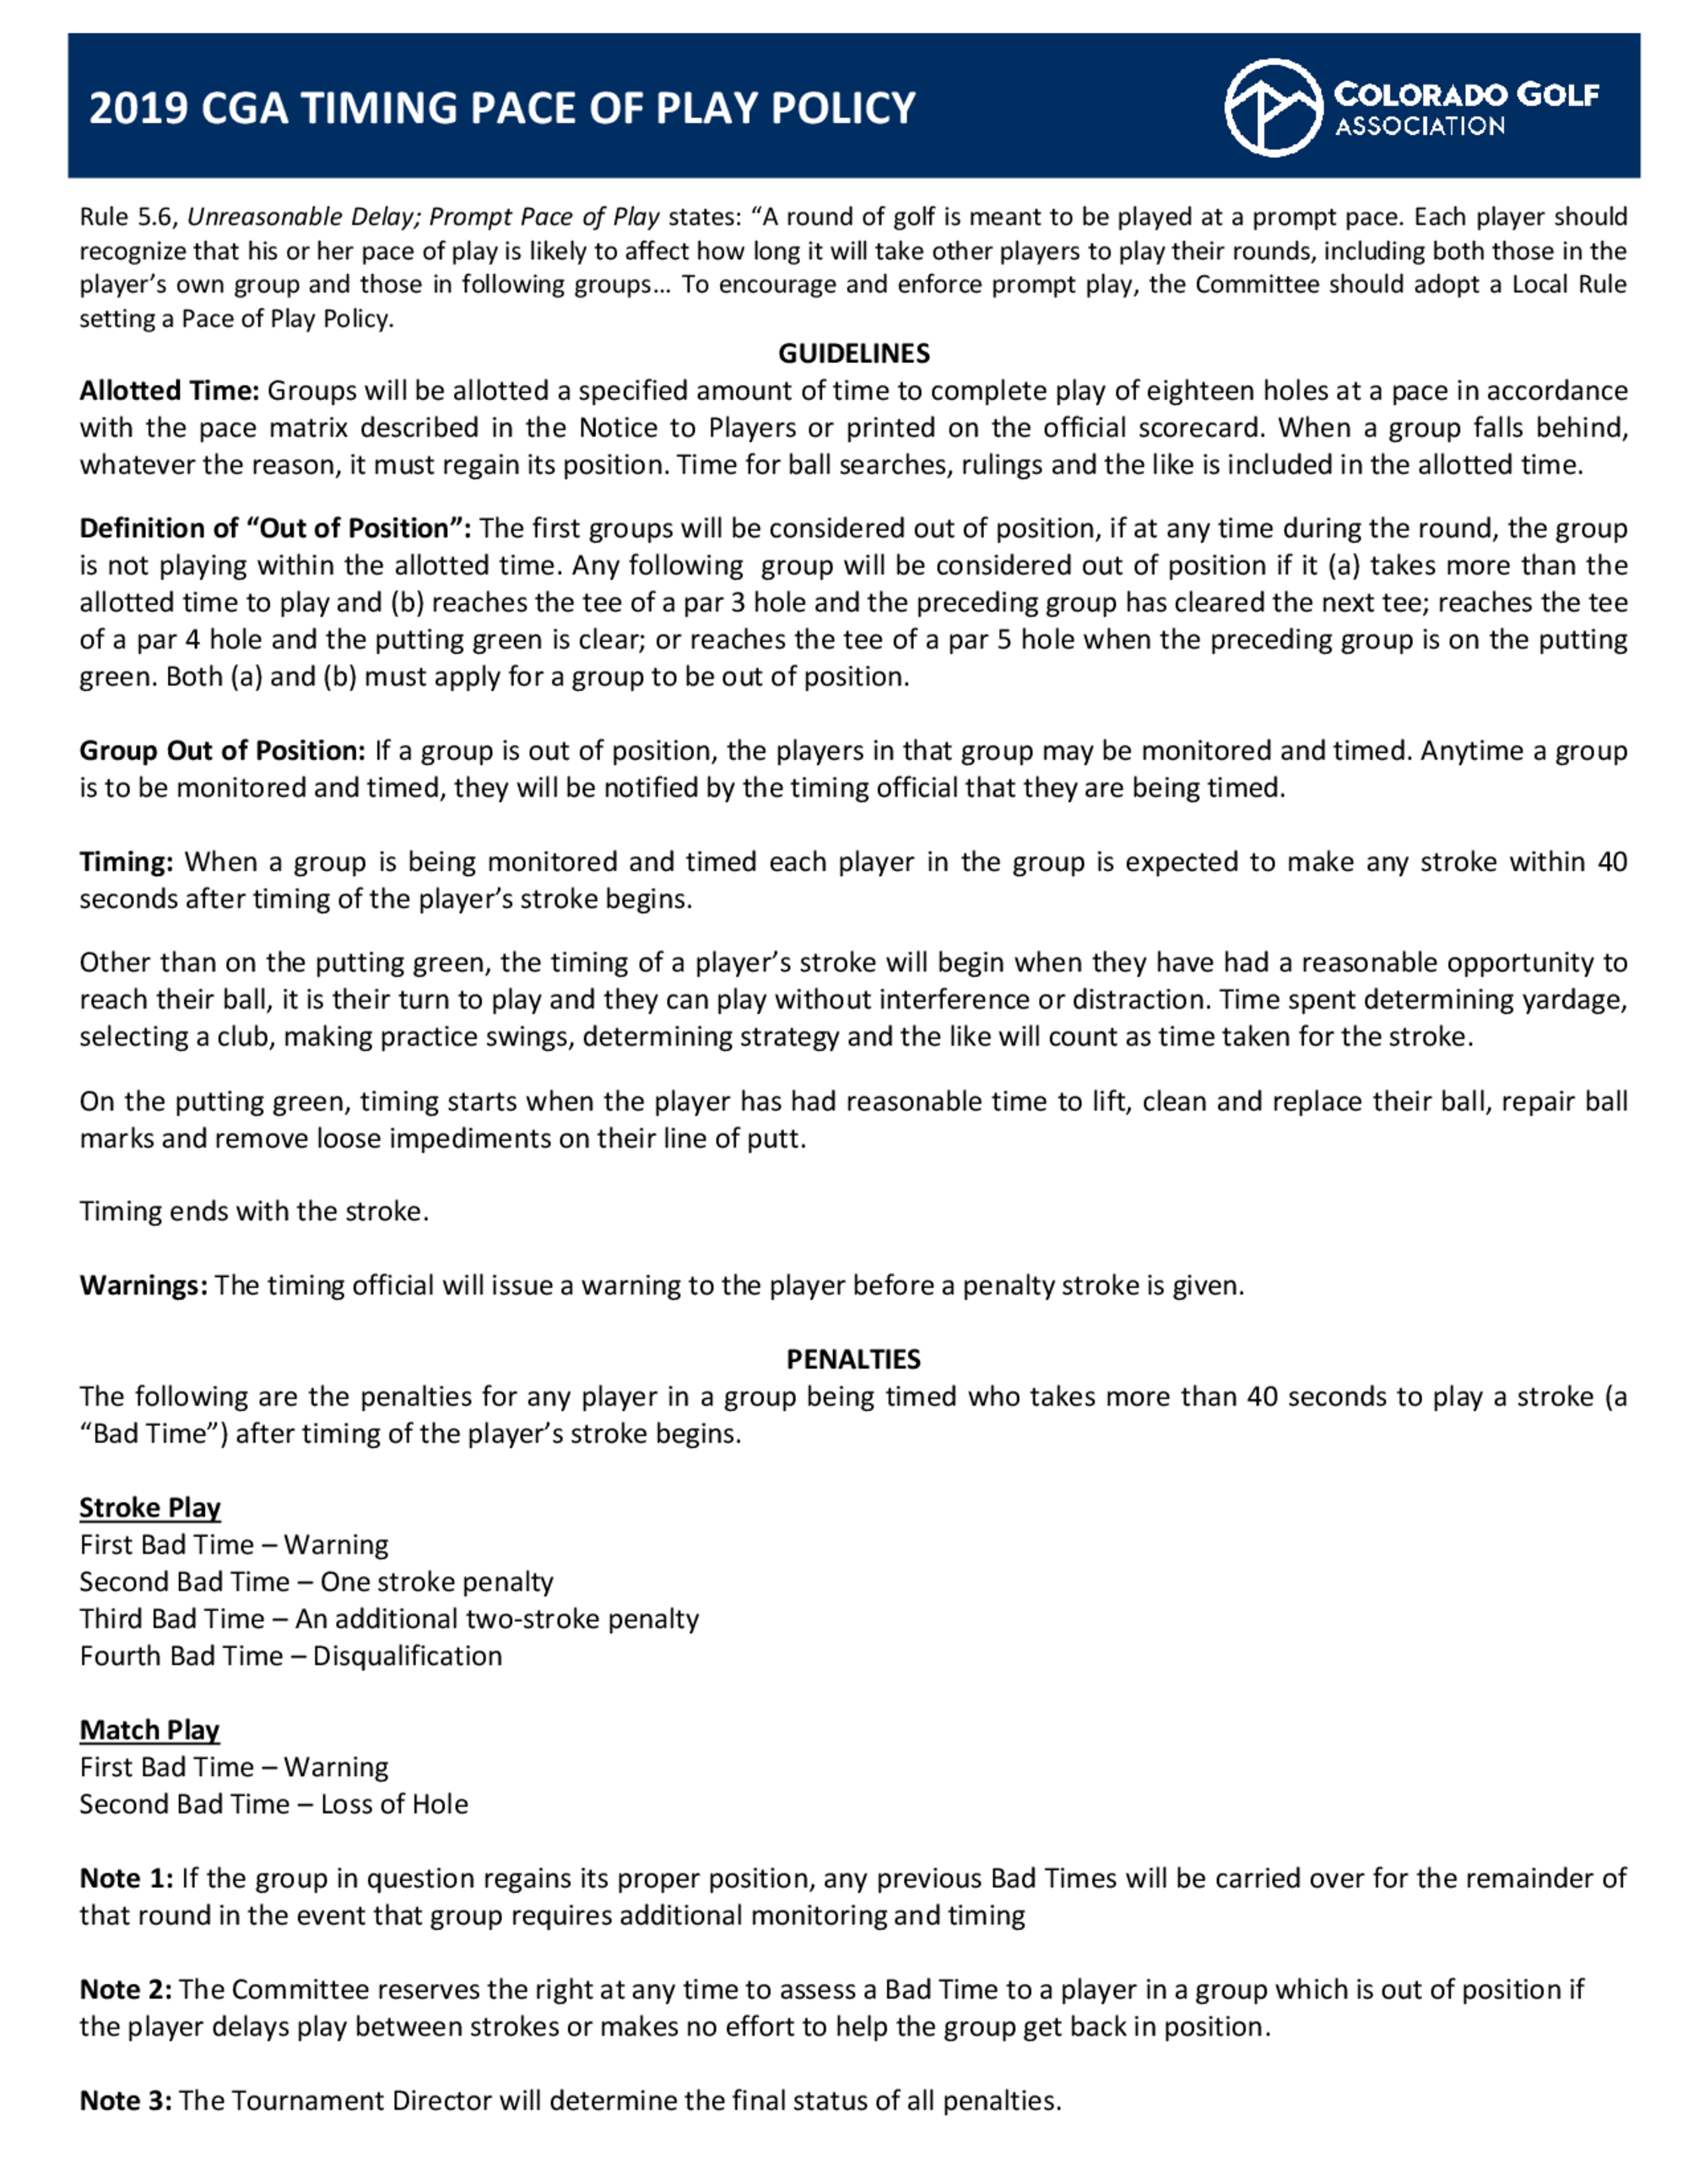 2019 usga warning timing policy 1